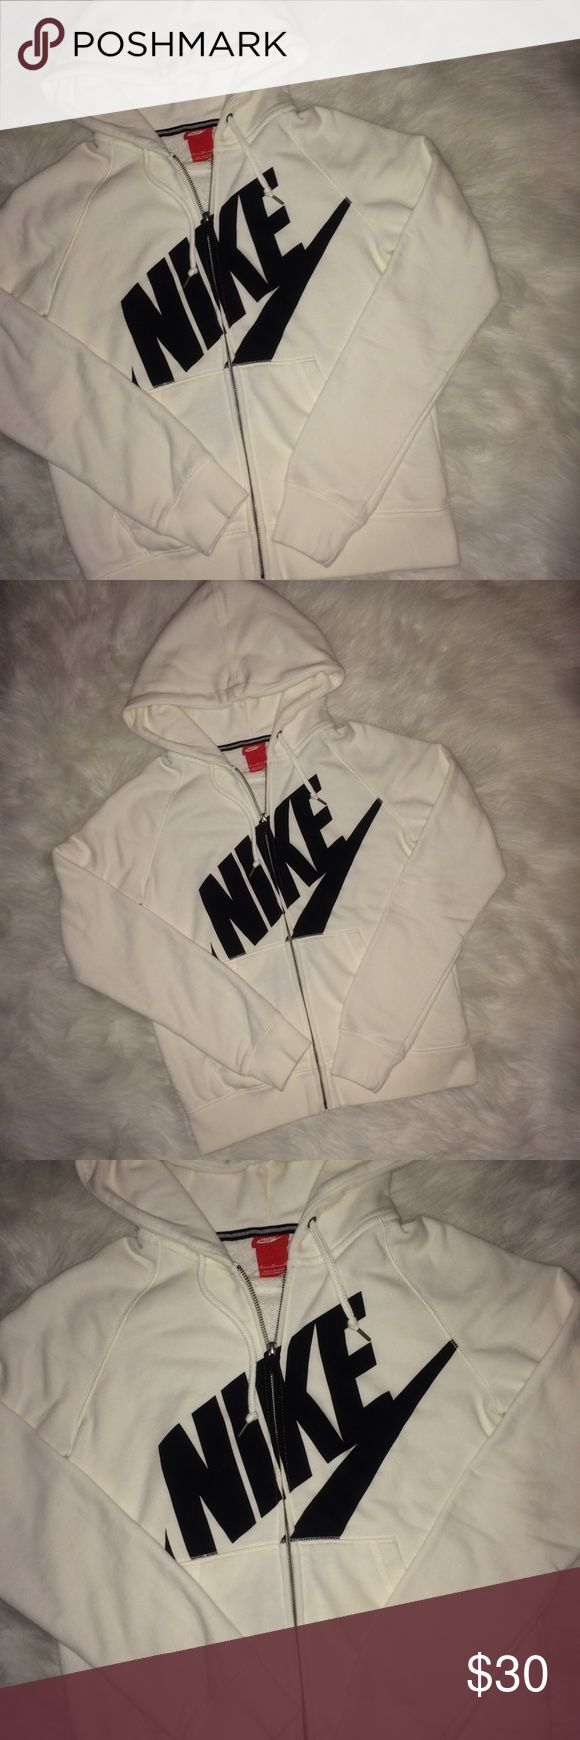 NIKE creamy white Zip-up hoodie NIKE creamy white Zip-up hoodie, NWOT, inside is that cool towel-like fabric Nike Jackets & Coats